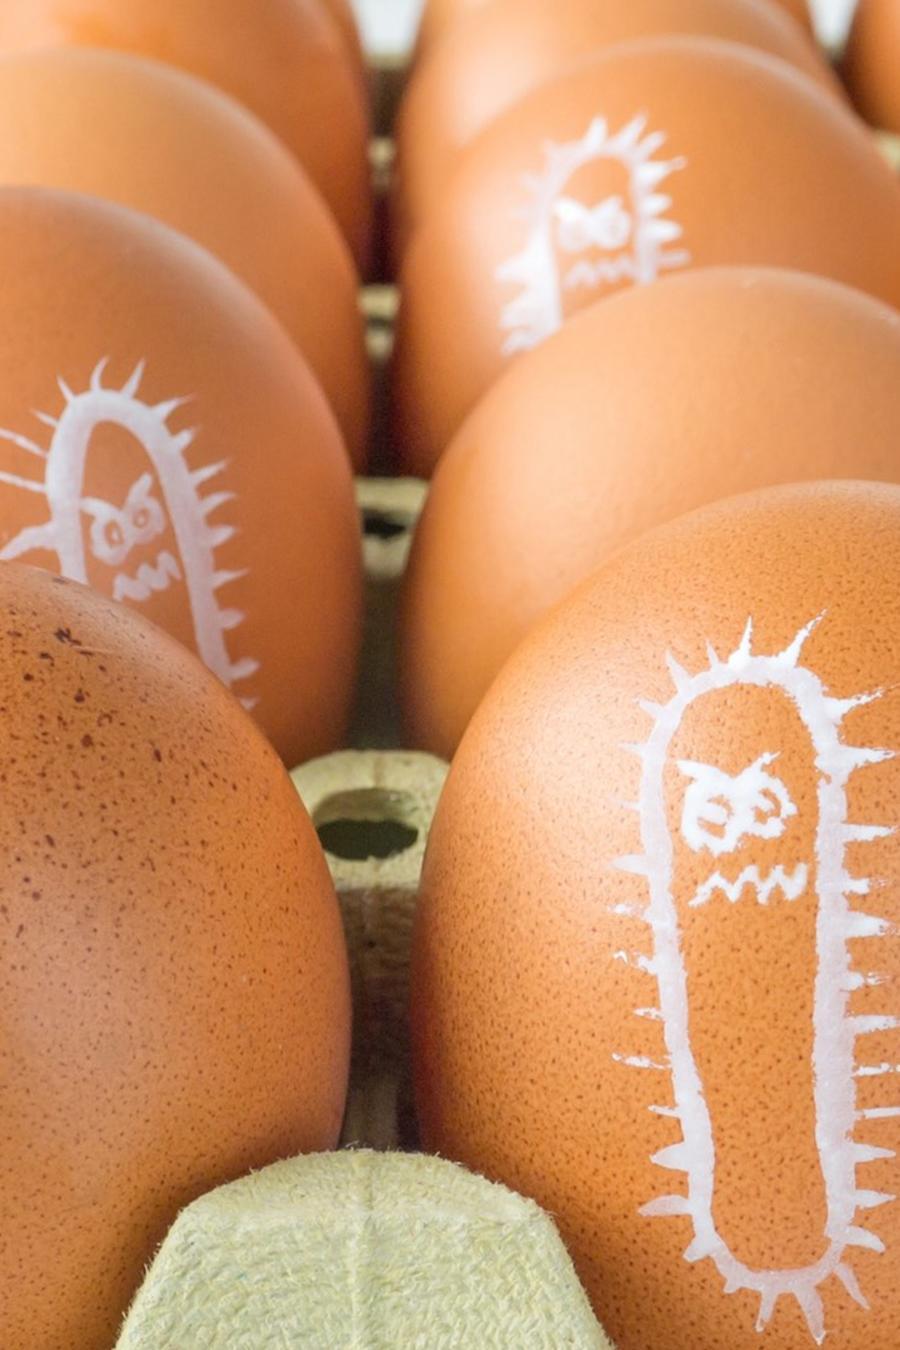 Huevos con dibujo de bacteria salmonela